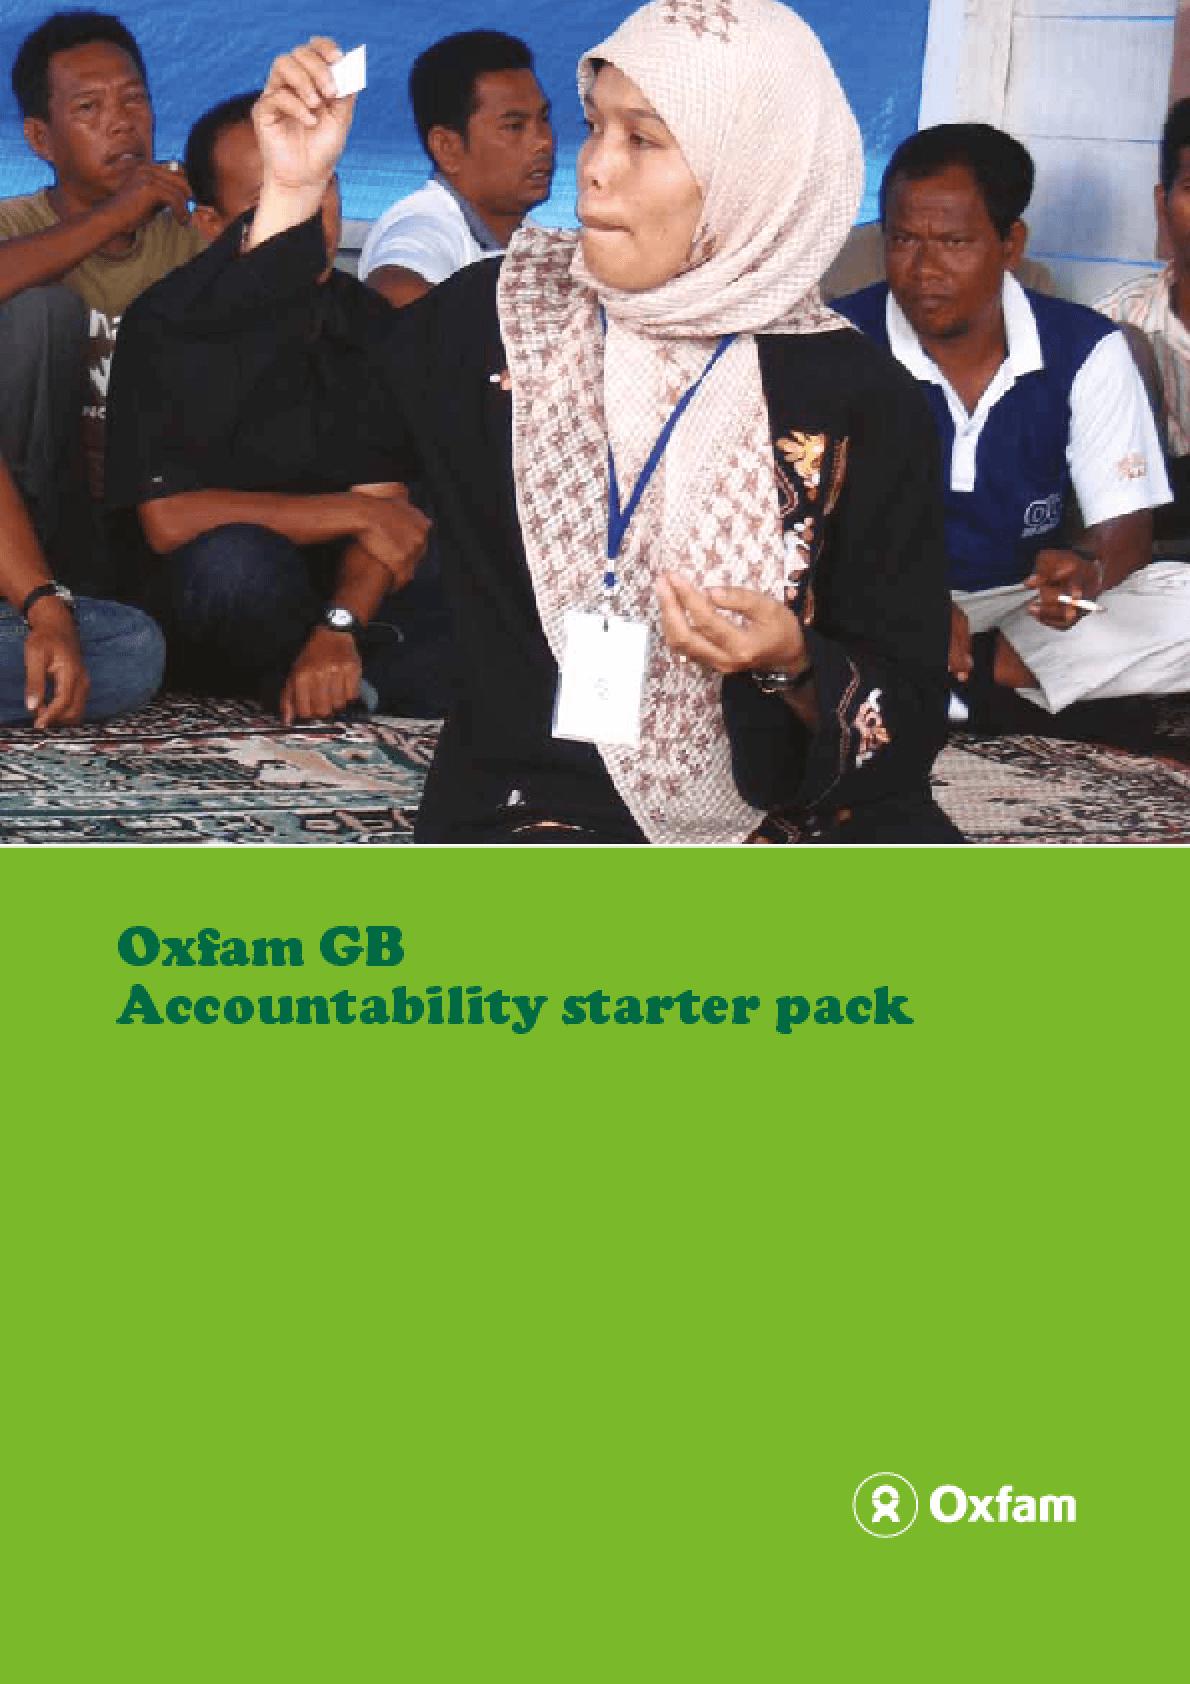 Oxfam GB: Accountability Starter Pack